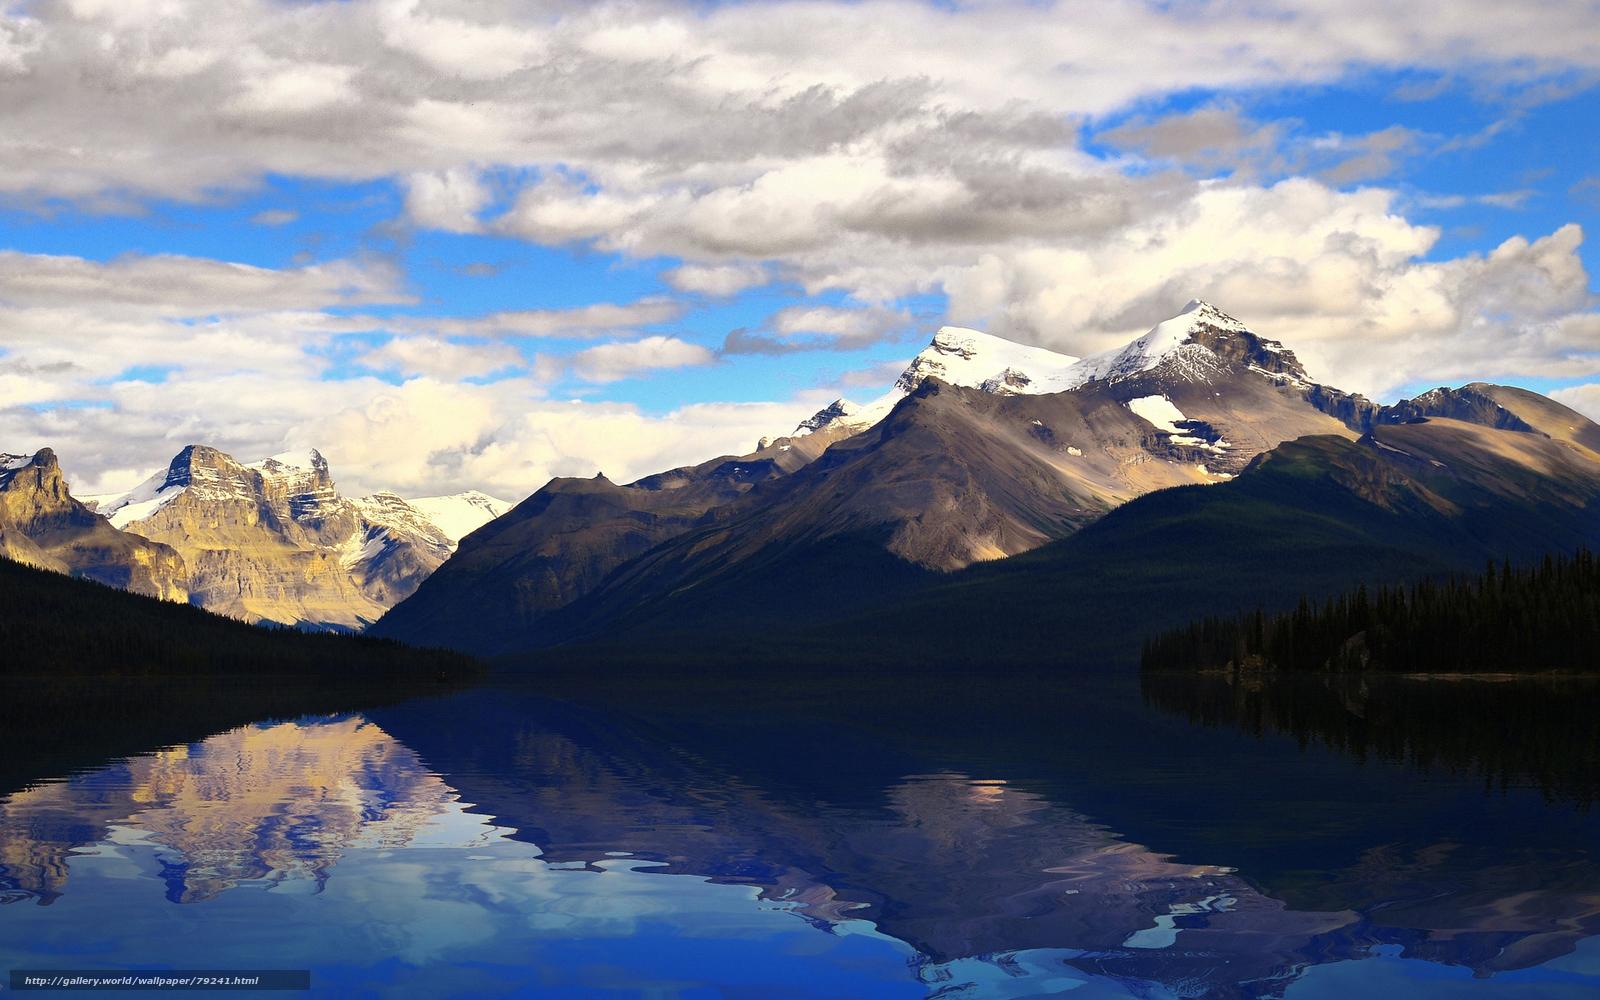 Descargar gratis paisajes papel pintado montaas agua - Papel pintado paisaje ...